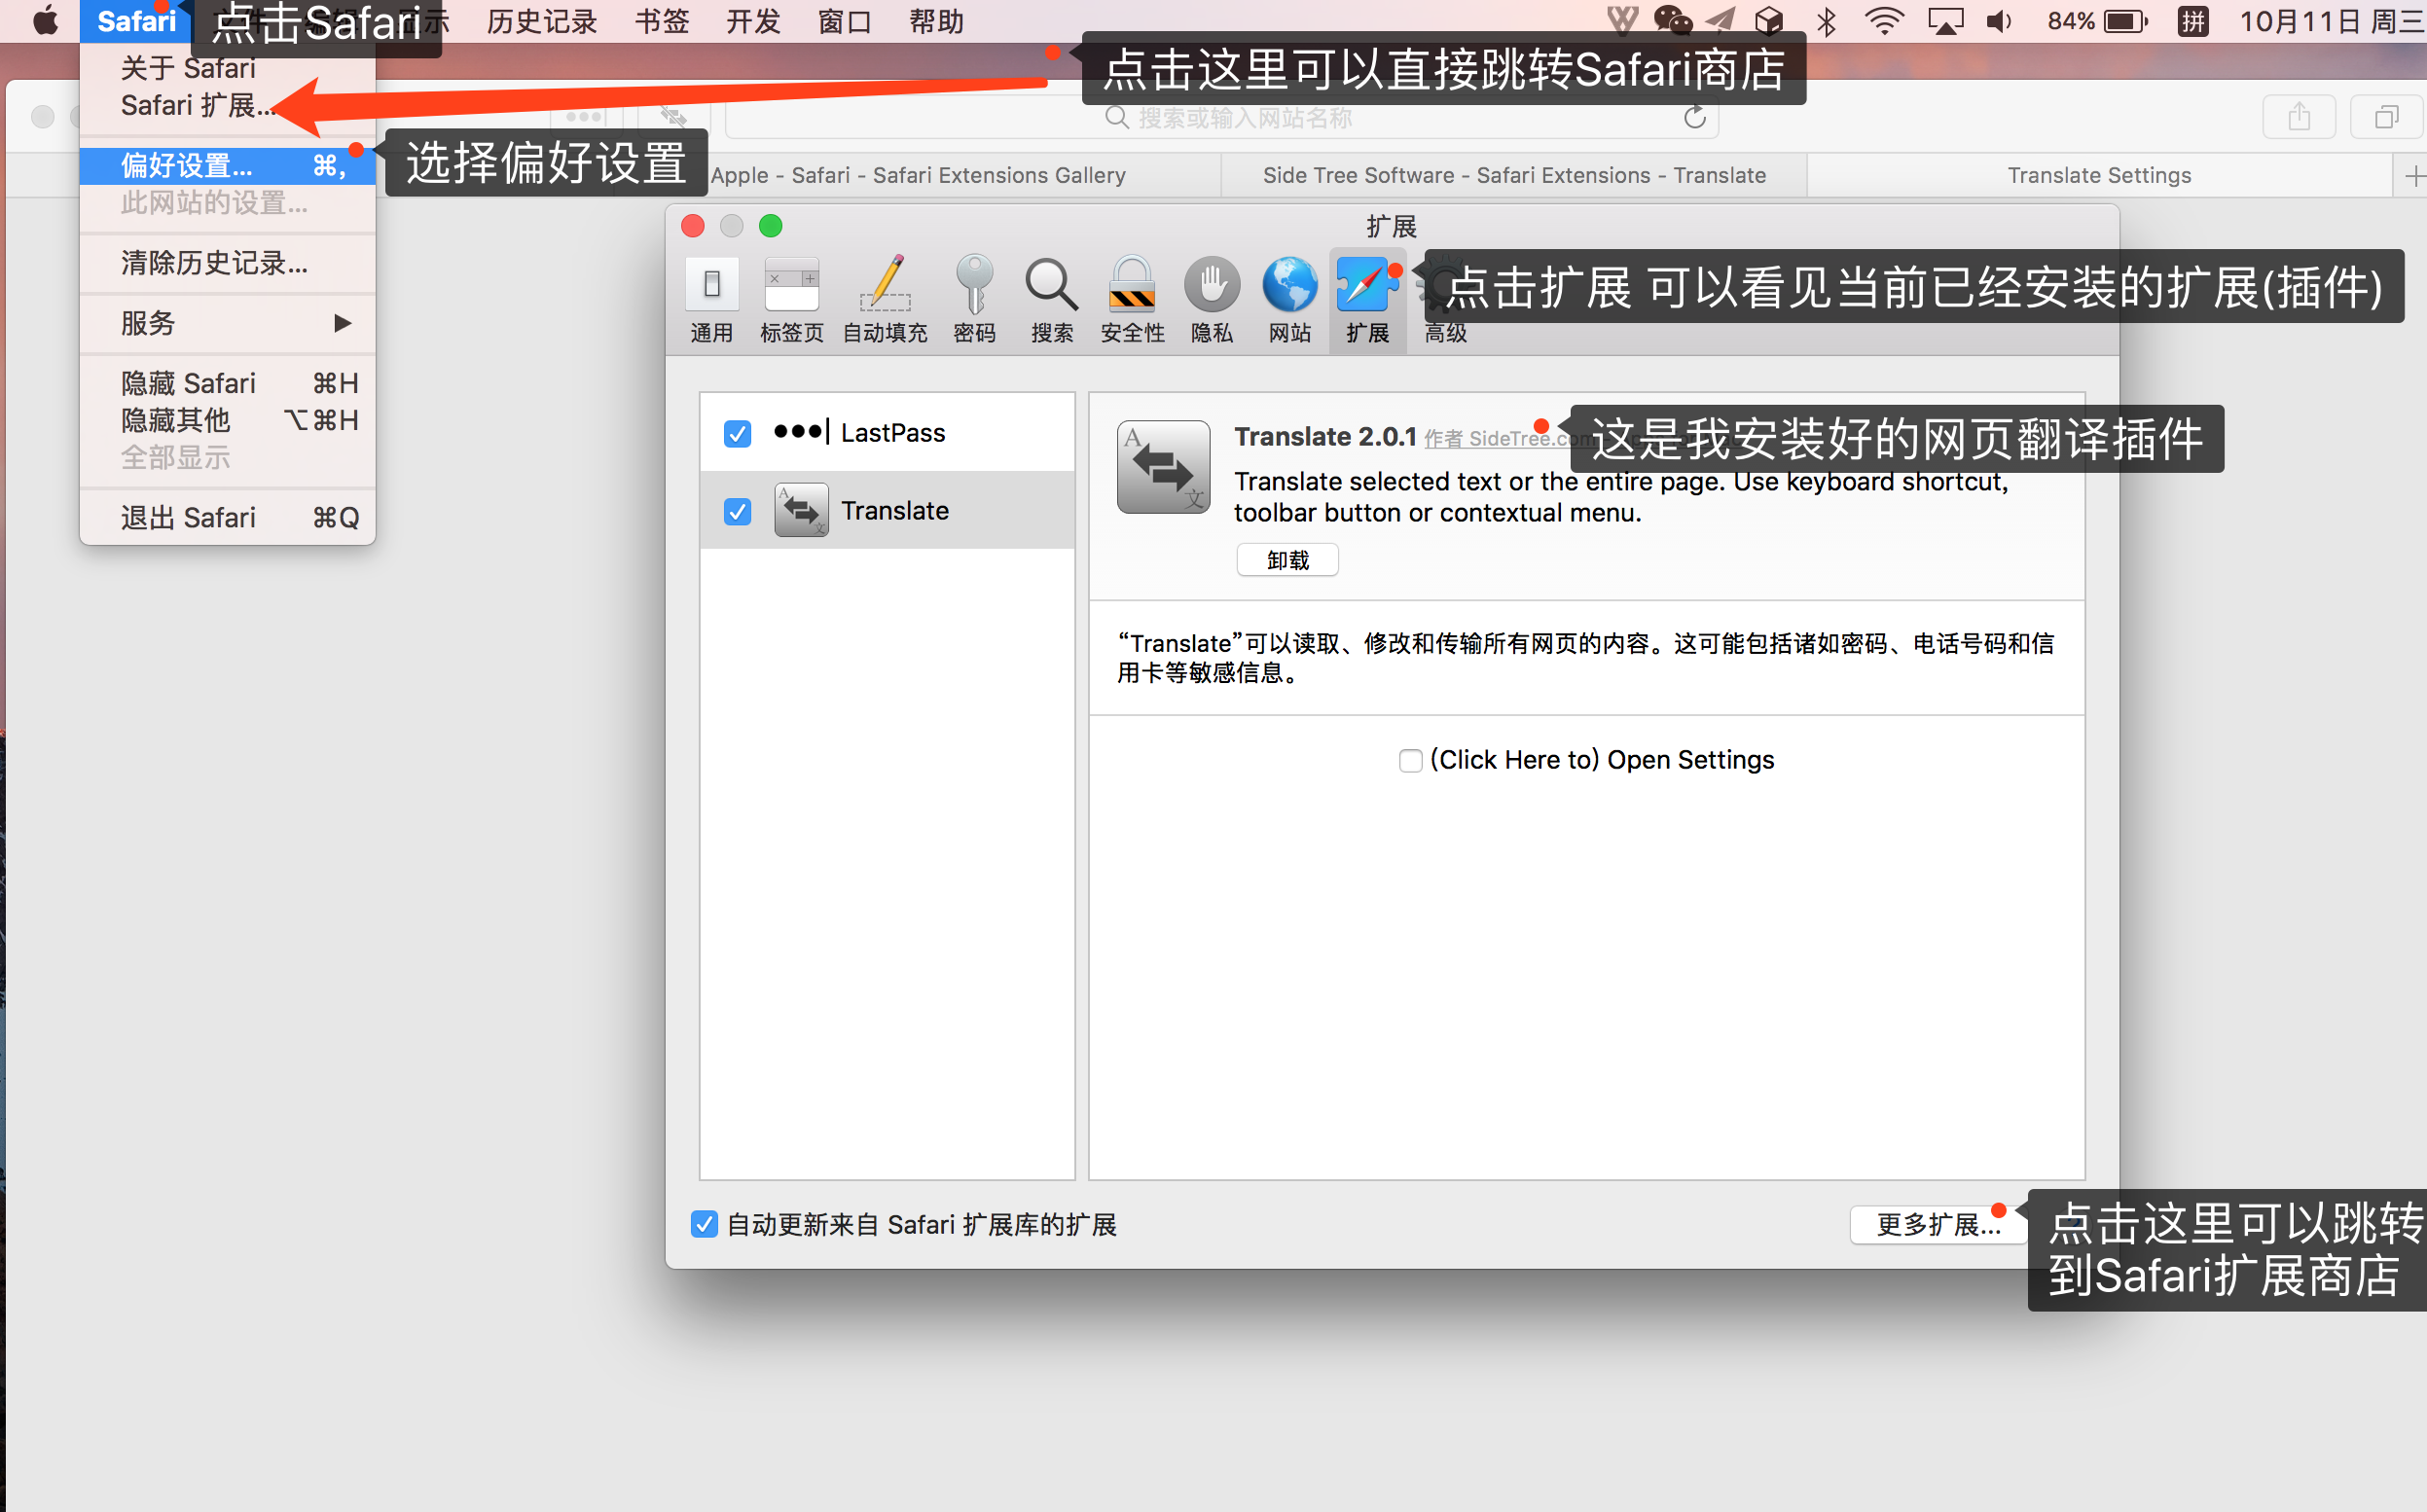 Safari浏览器安装网页翻译插件(扩展)的方法